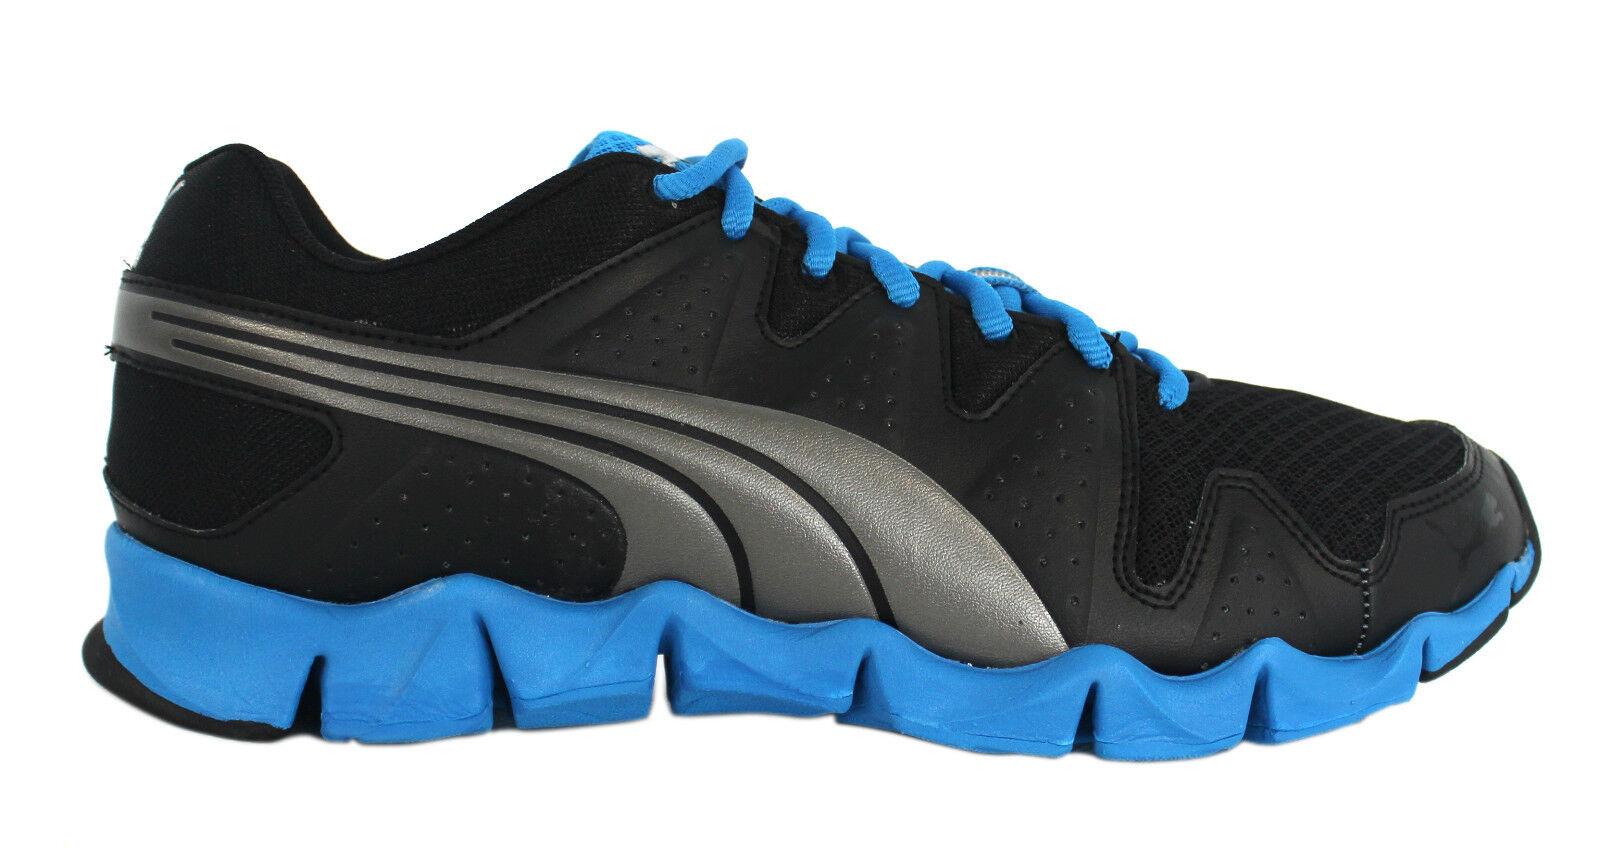 Puma Shintai Runner Mens Trainers Black Blue Mesh Sports Price reduction Cheap women's shoes women's shoes